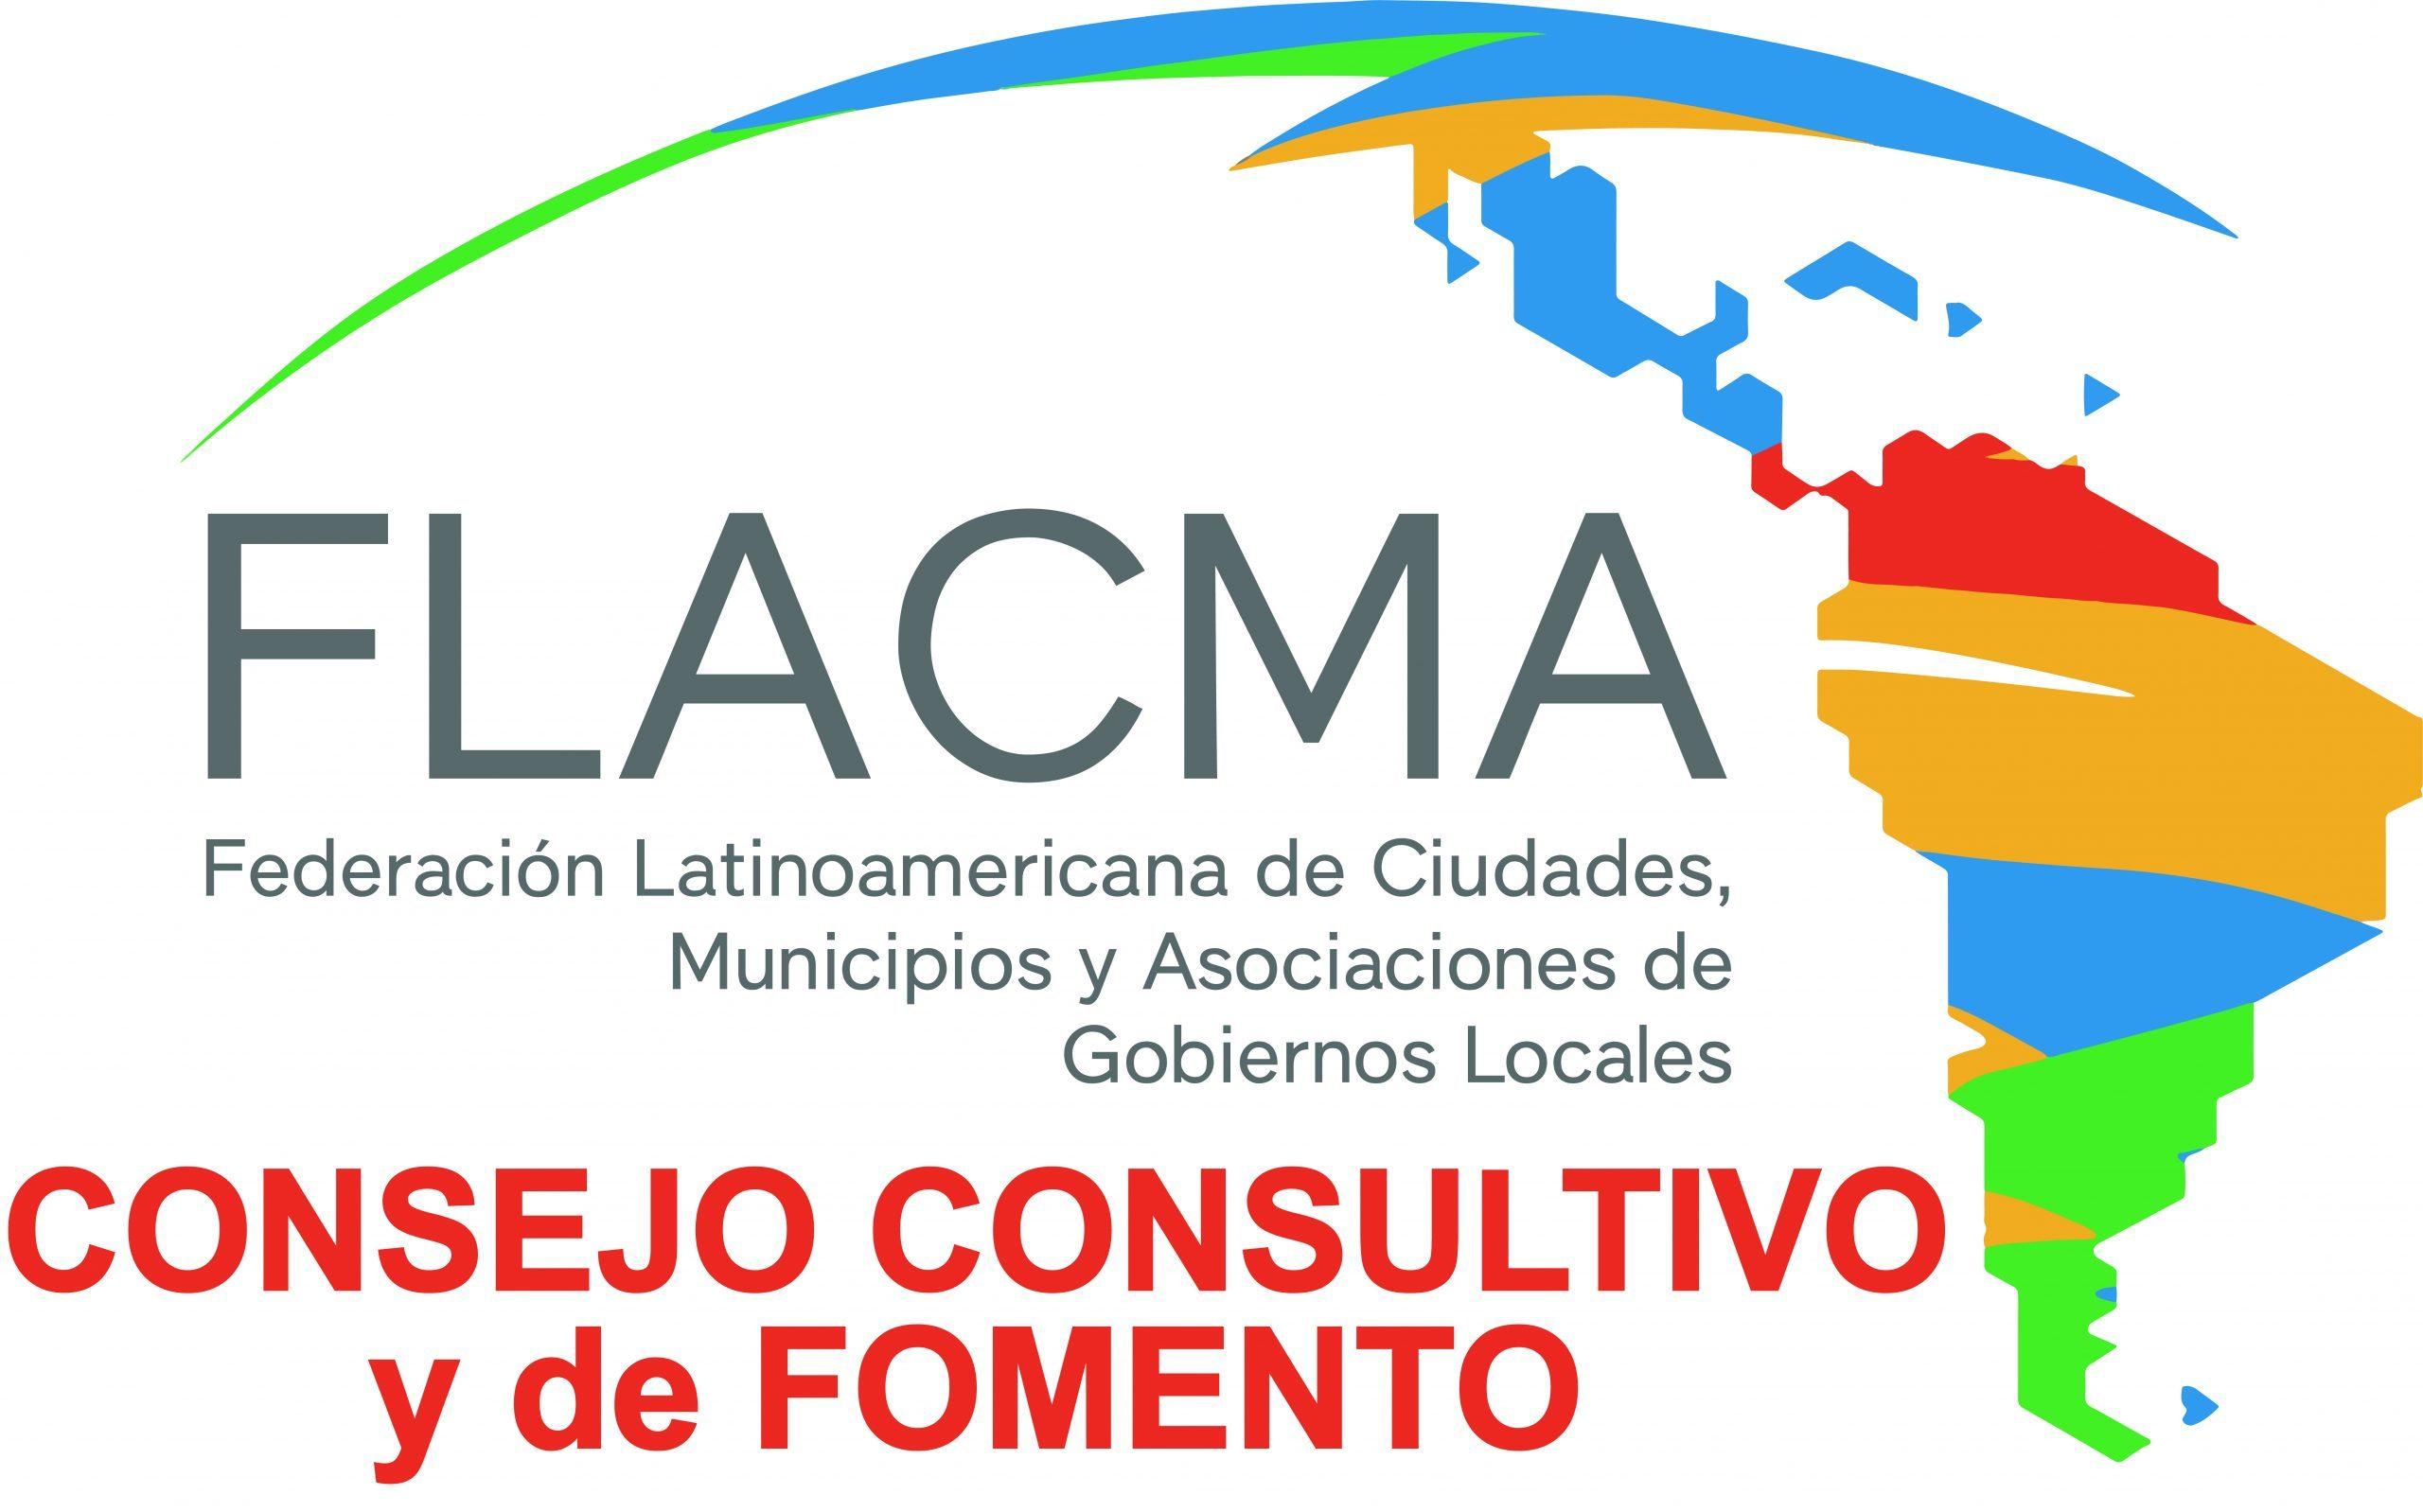 Consejo Consultivo de FLACMA